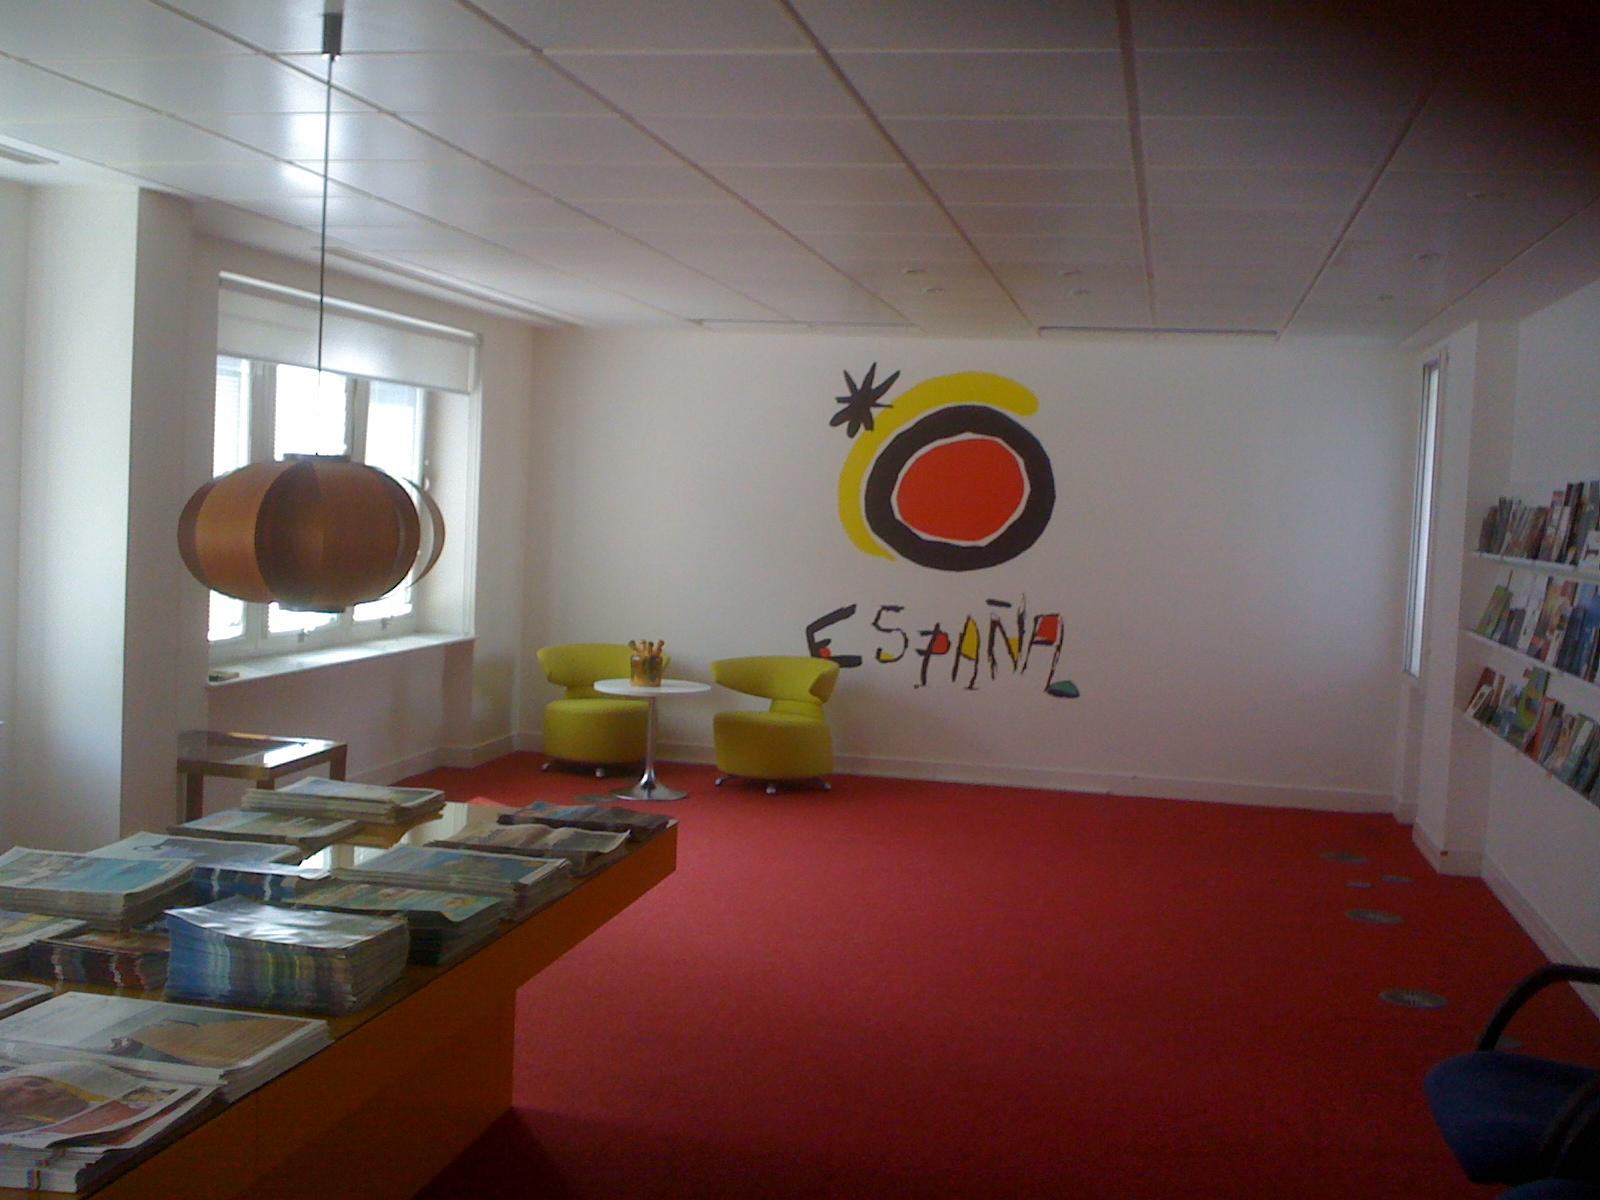 Blog de lingua globe visita de lingua globe a la oficina for Oficina turismo francia en madrid